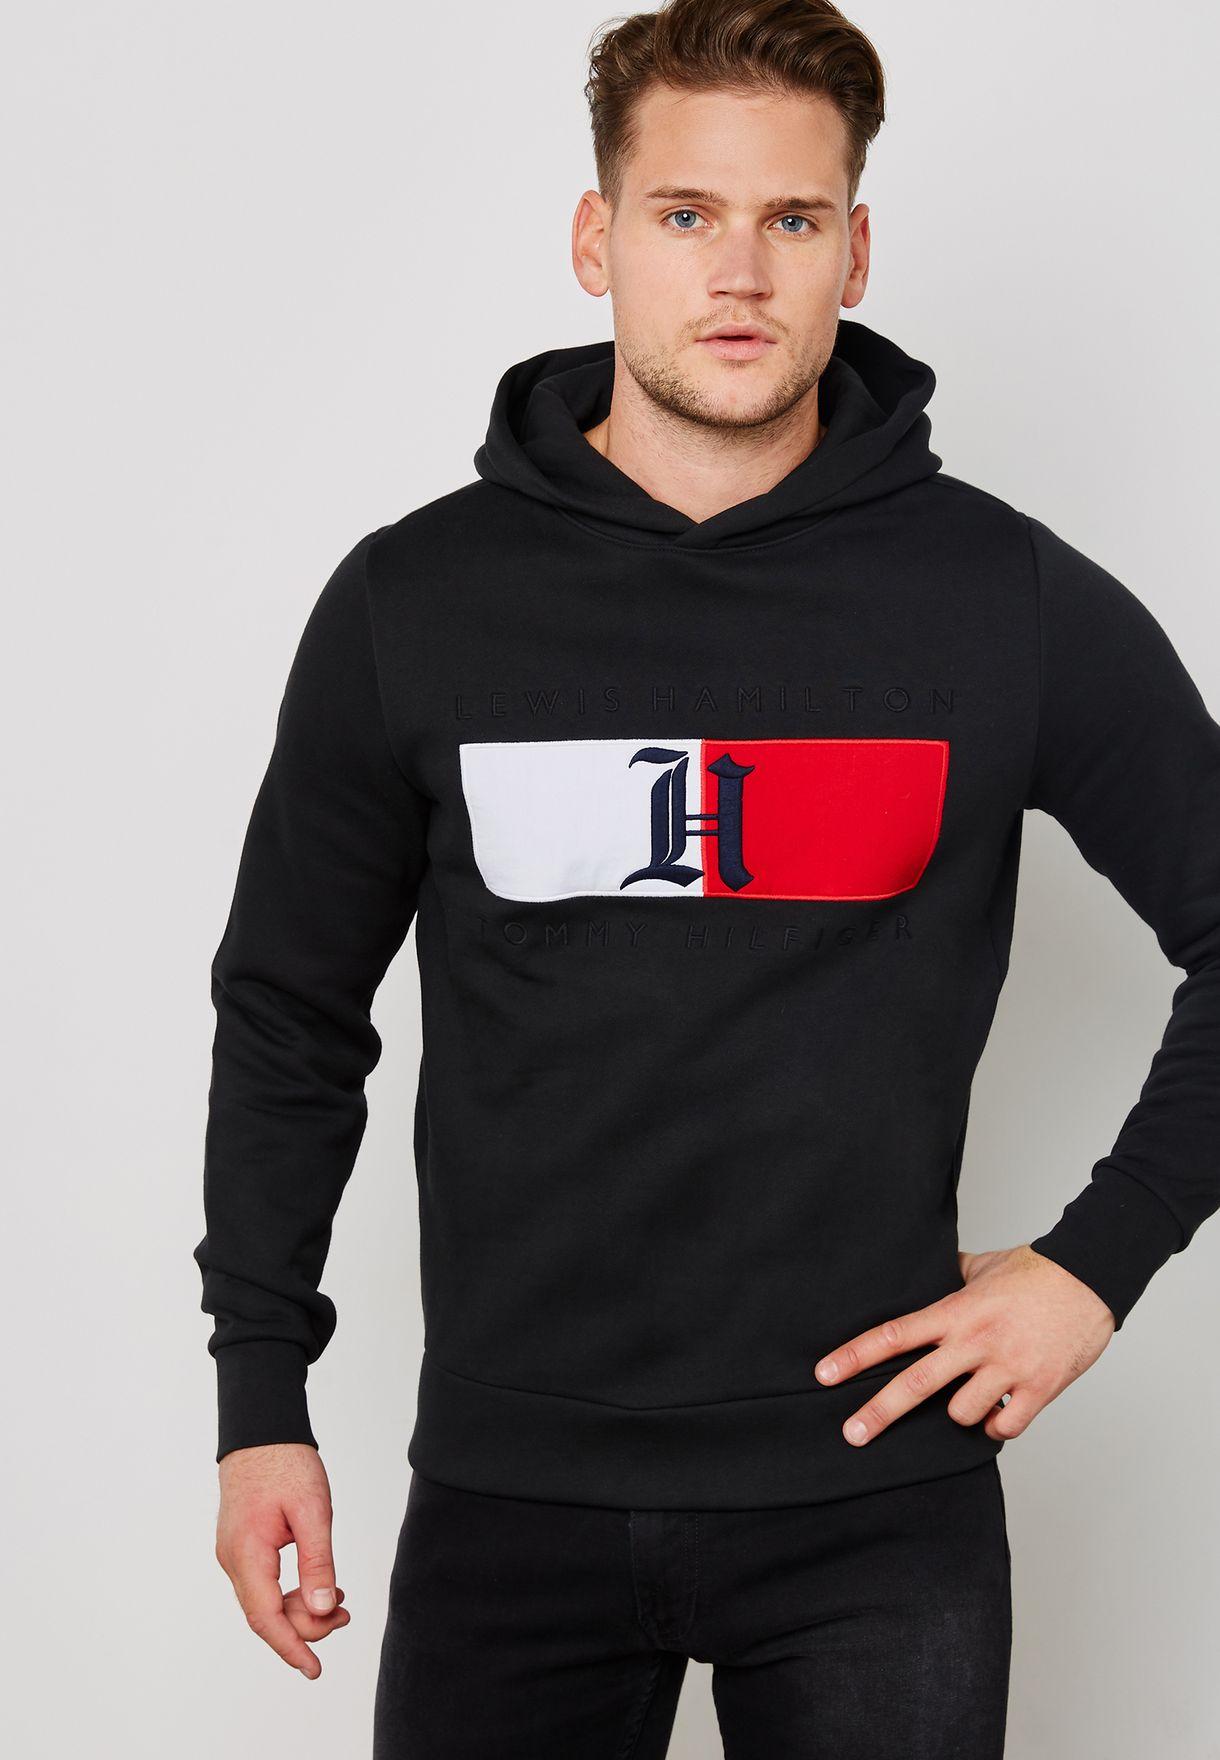 6a7e53a1 Shop Tommy Hilfiger black Lewis Hamilton Flag Logo Hoody ...